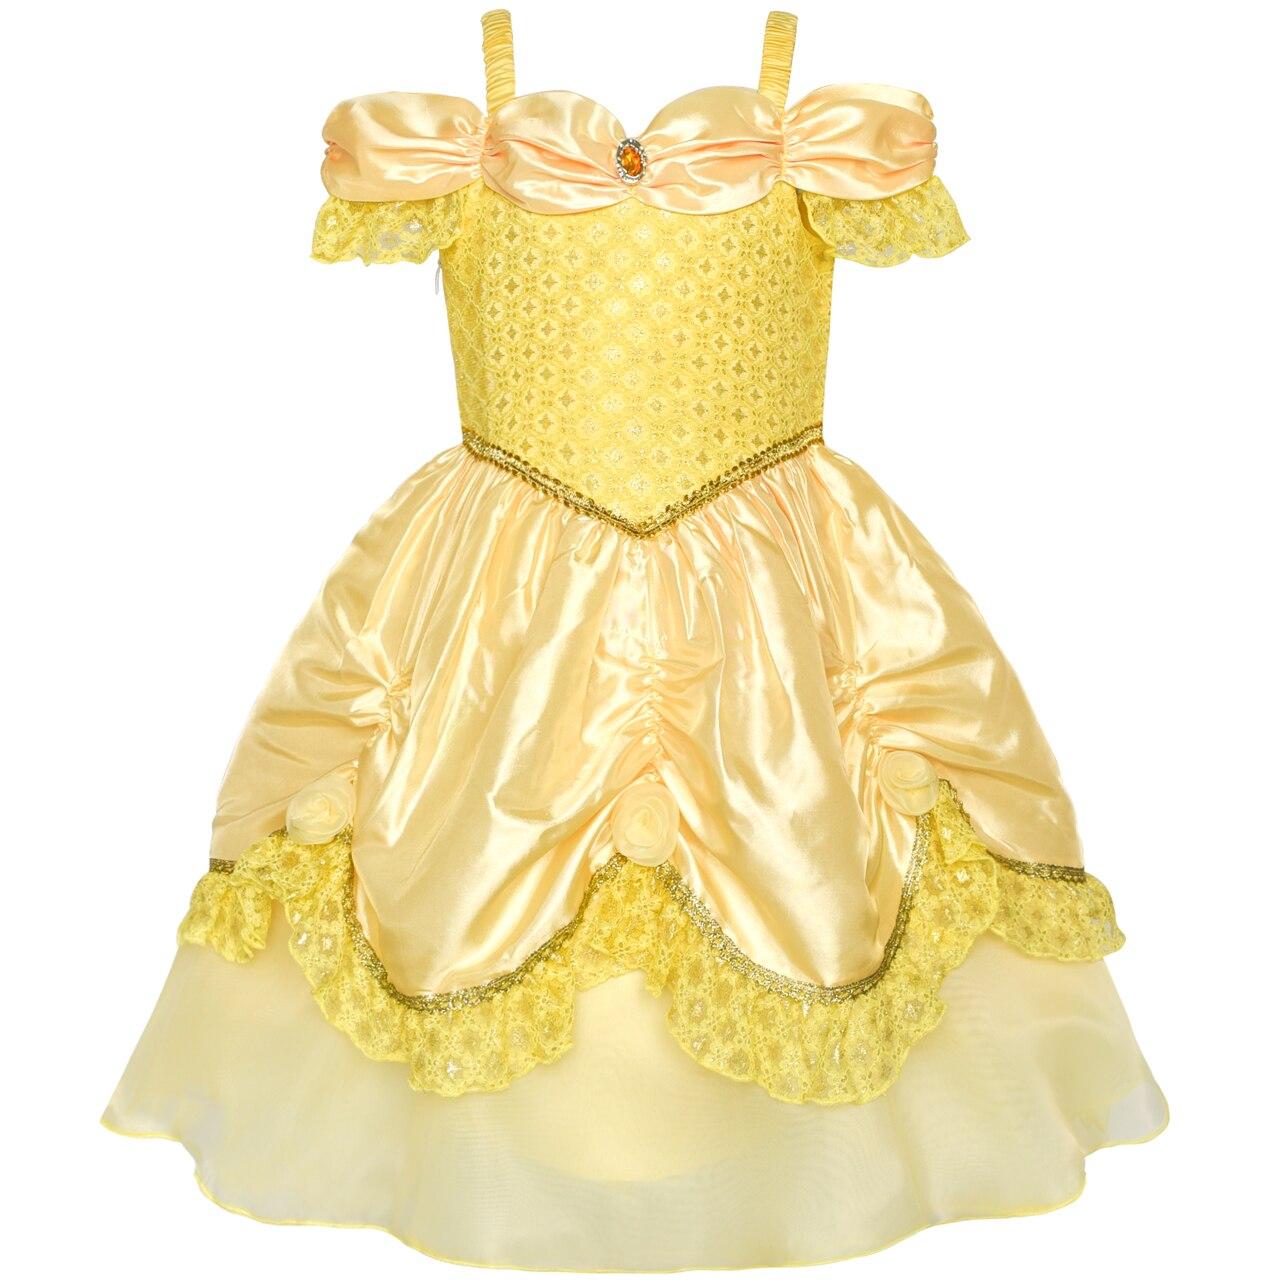 Girls Dress Yellow Princess Belle Costume Birthday Party ...